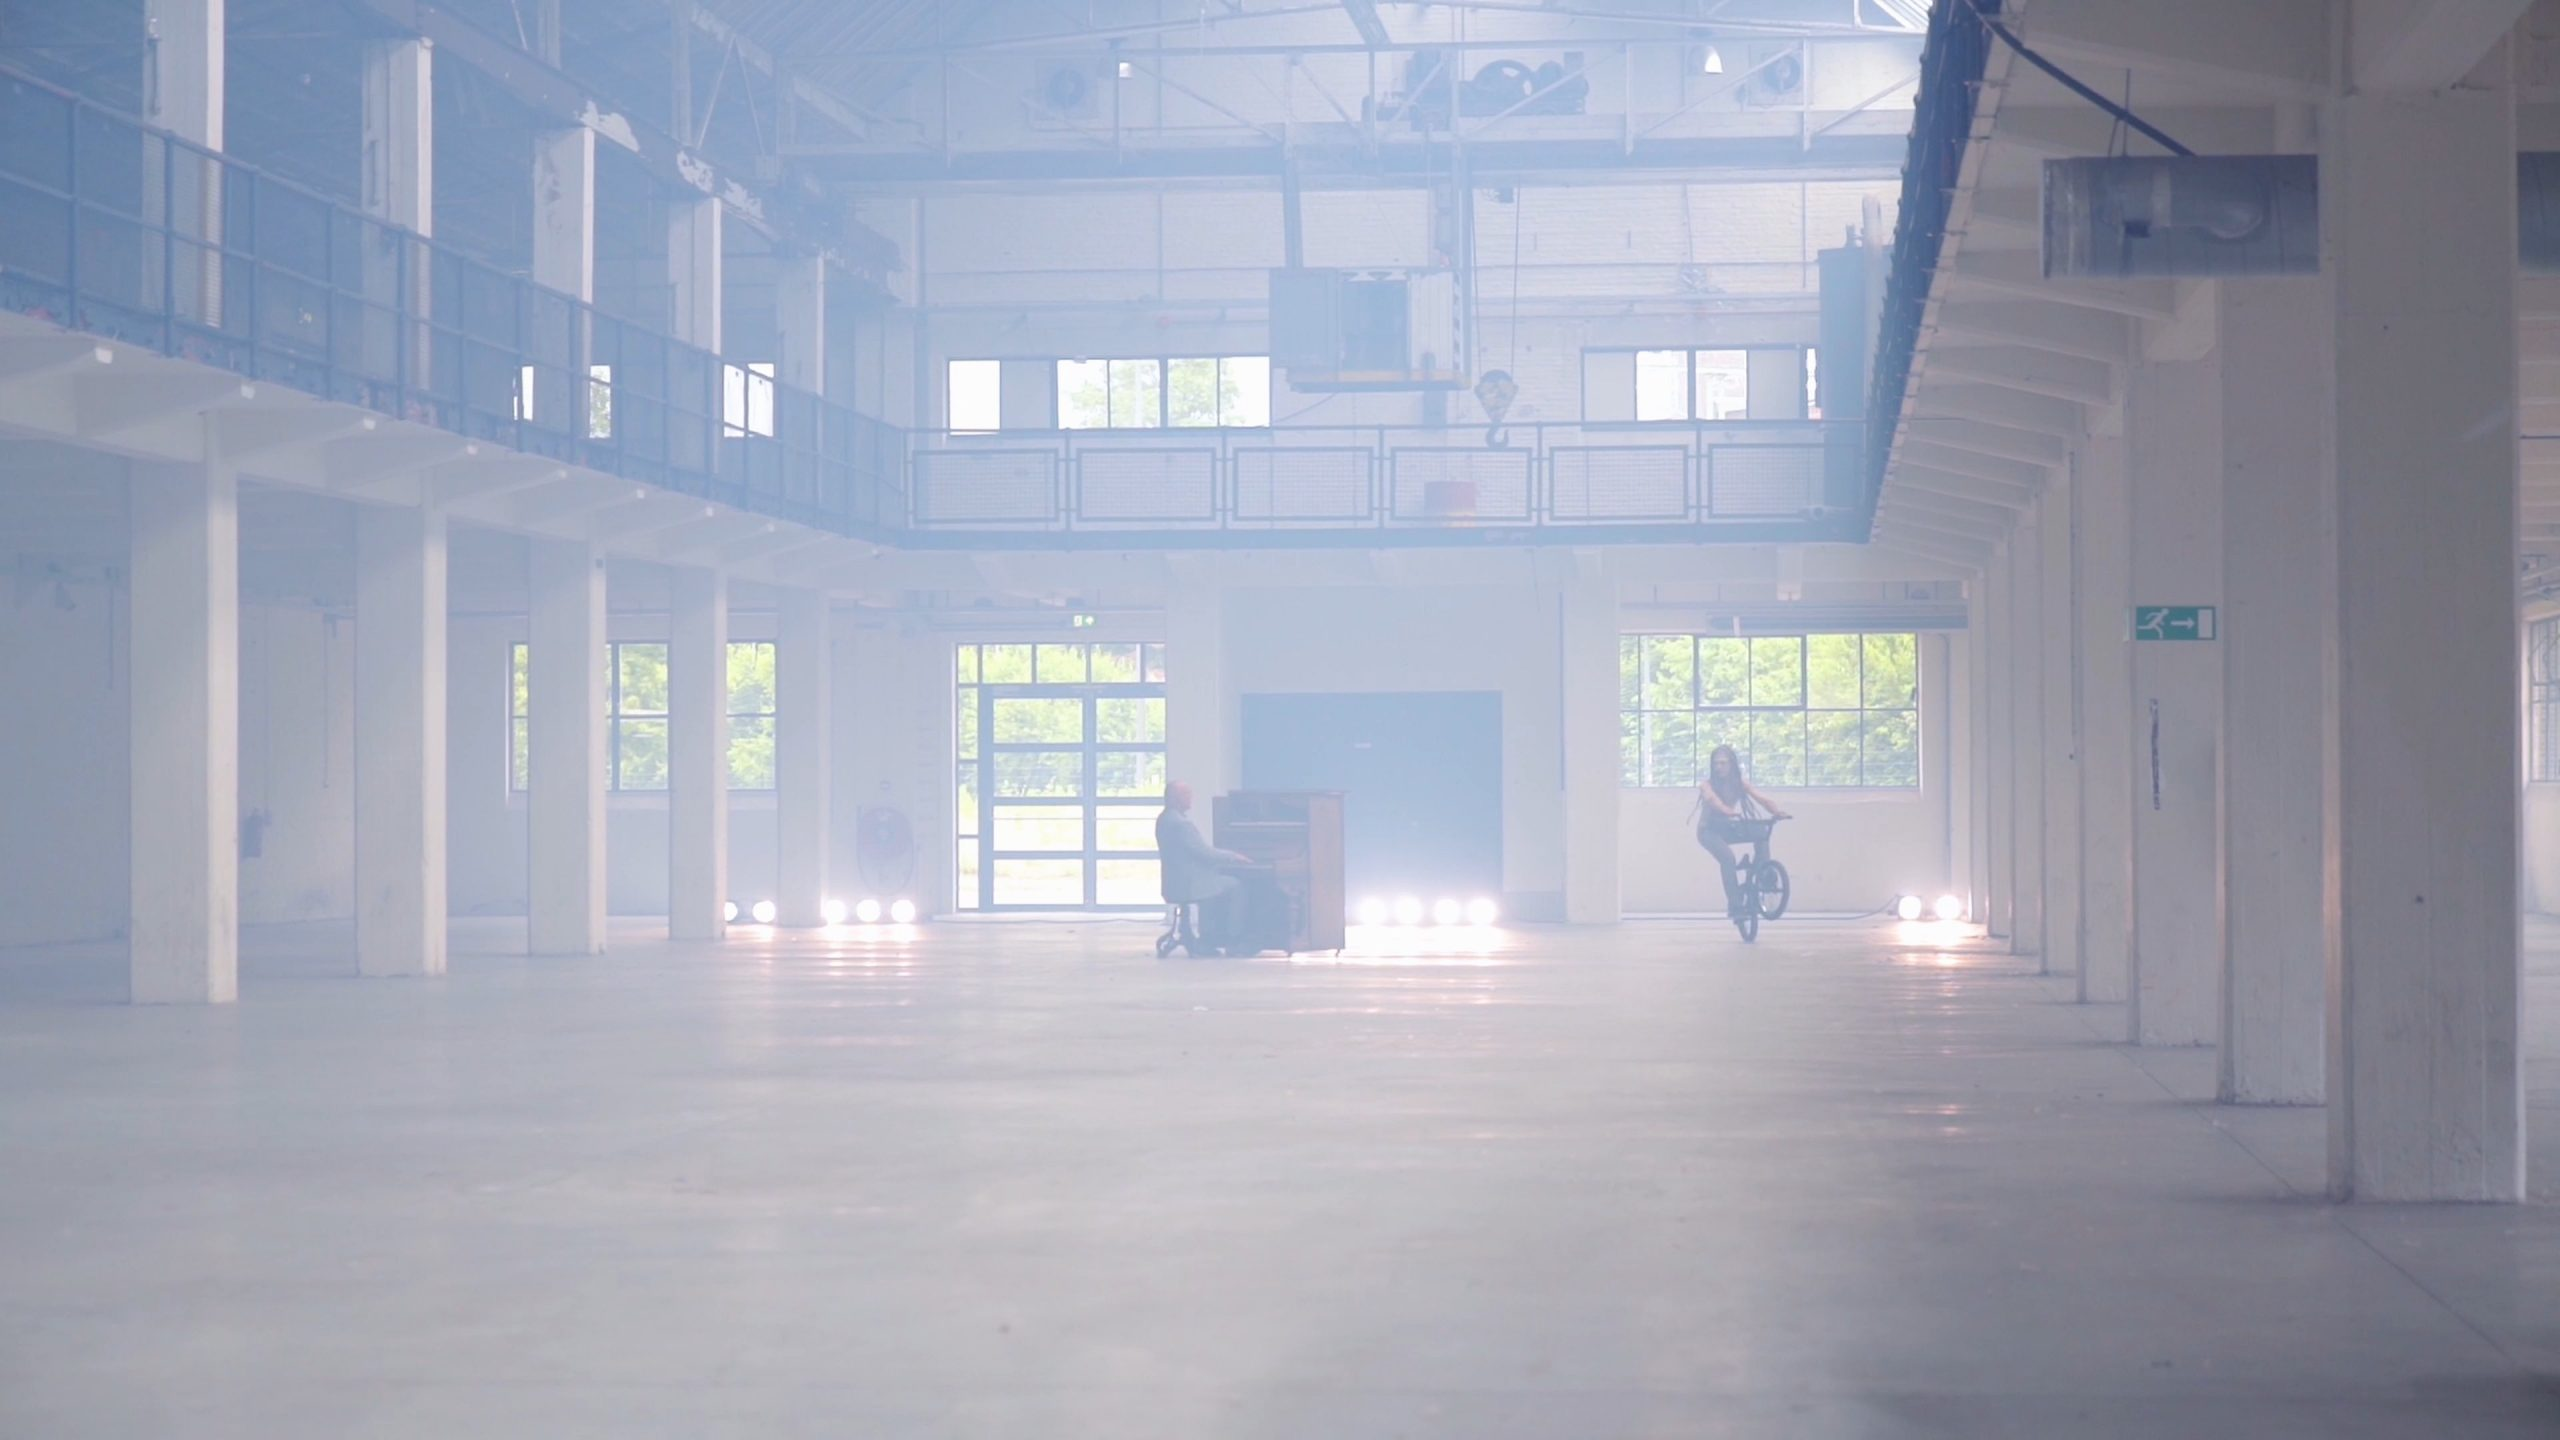 Latest music videos